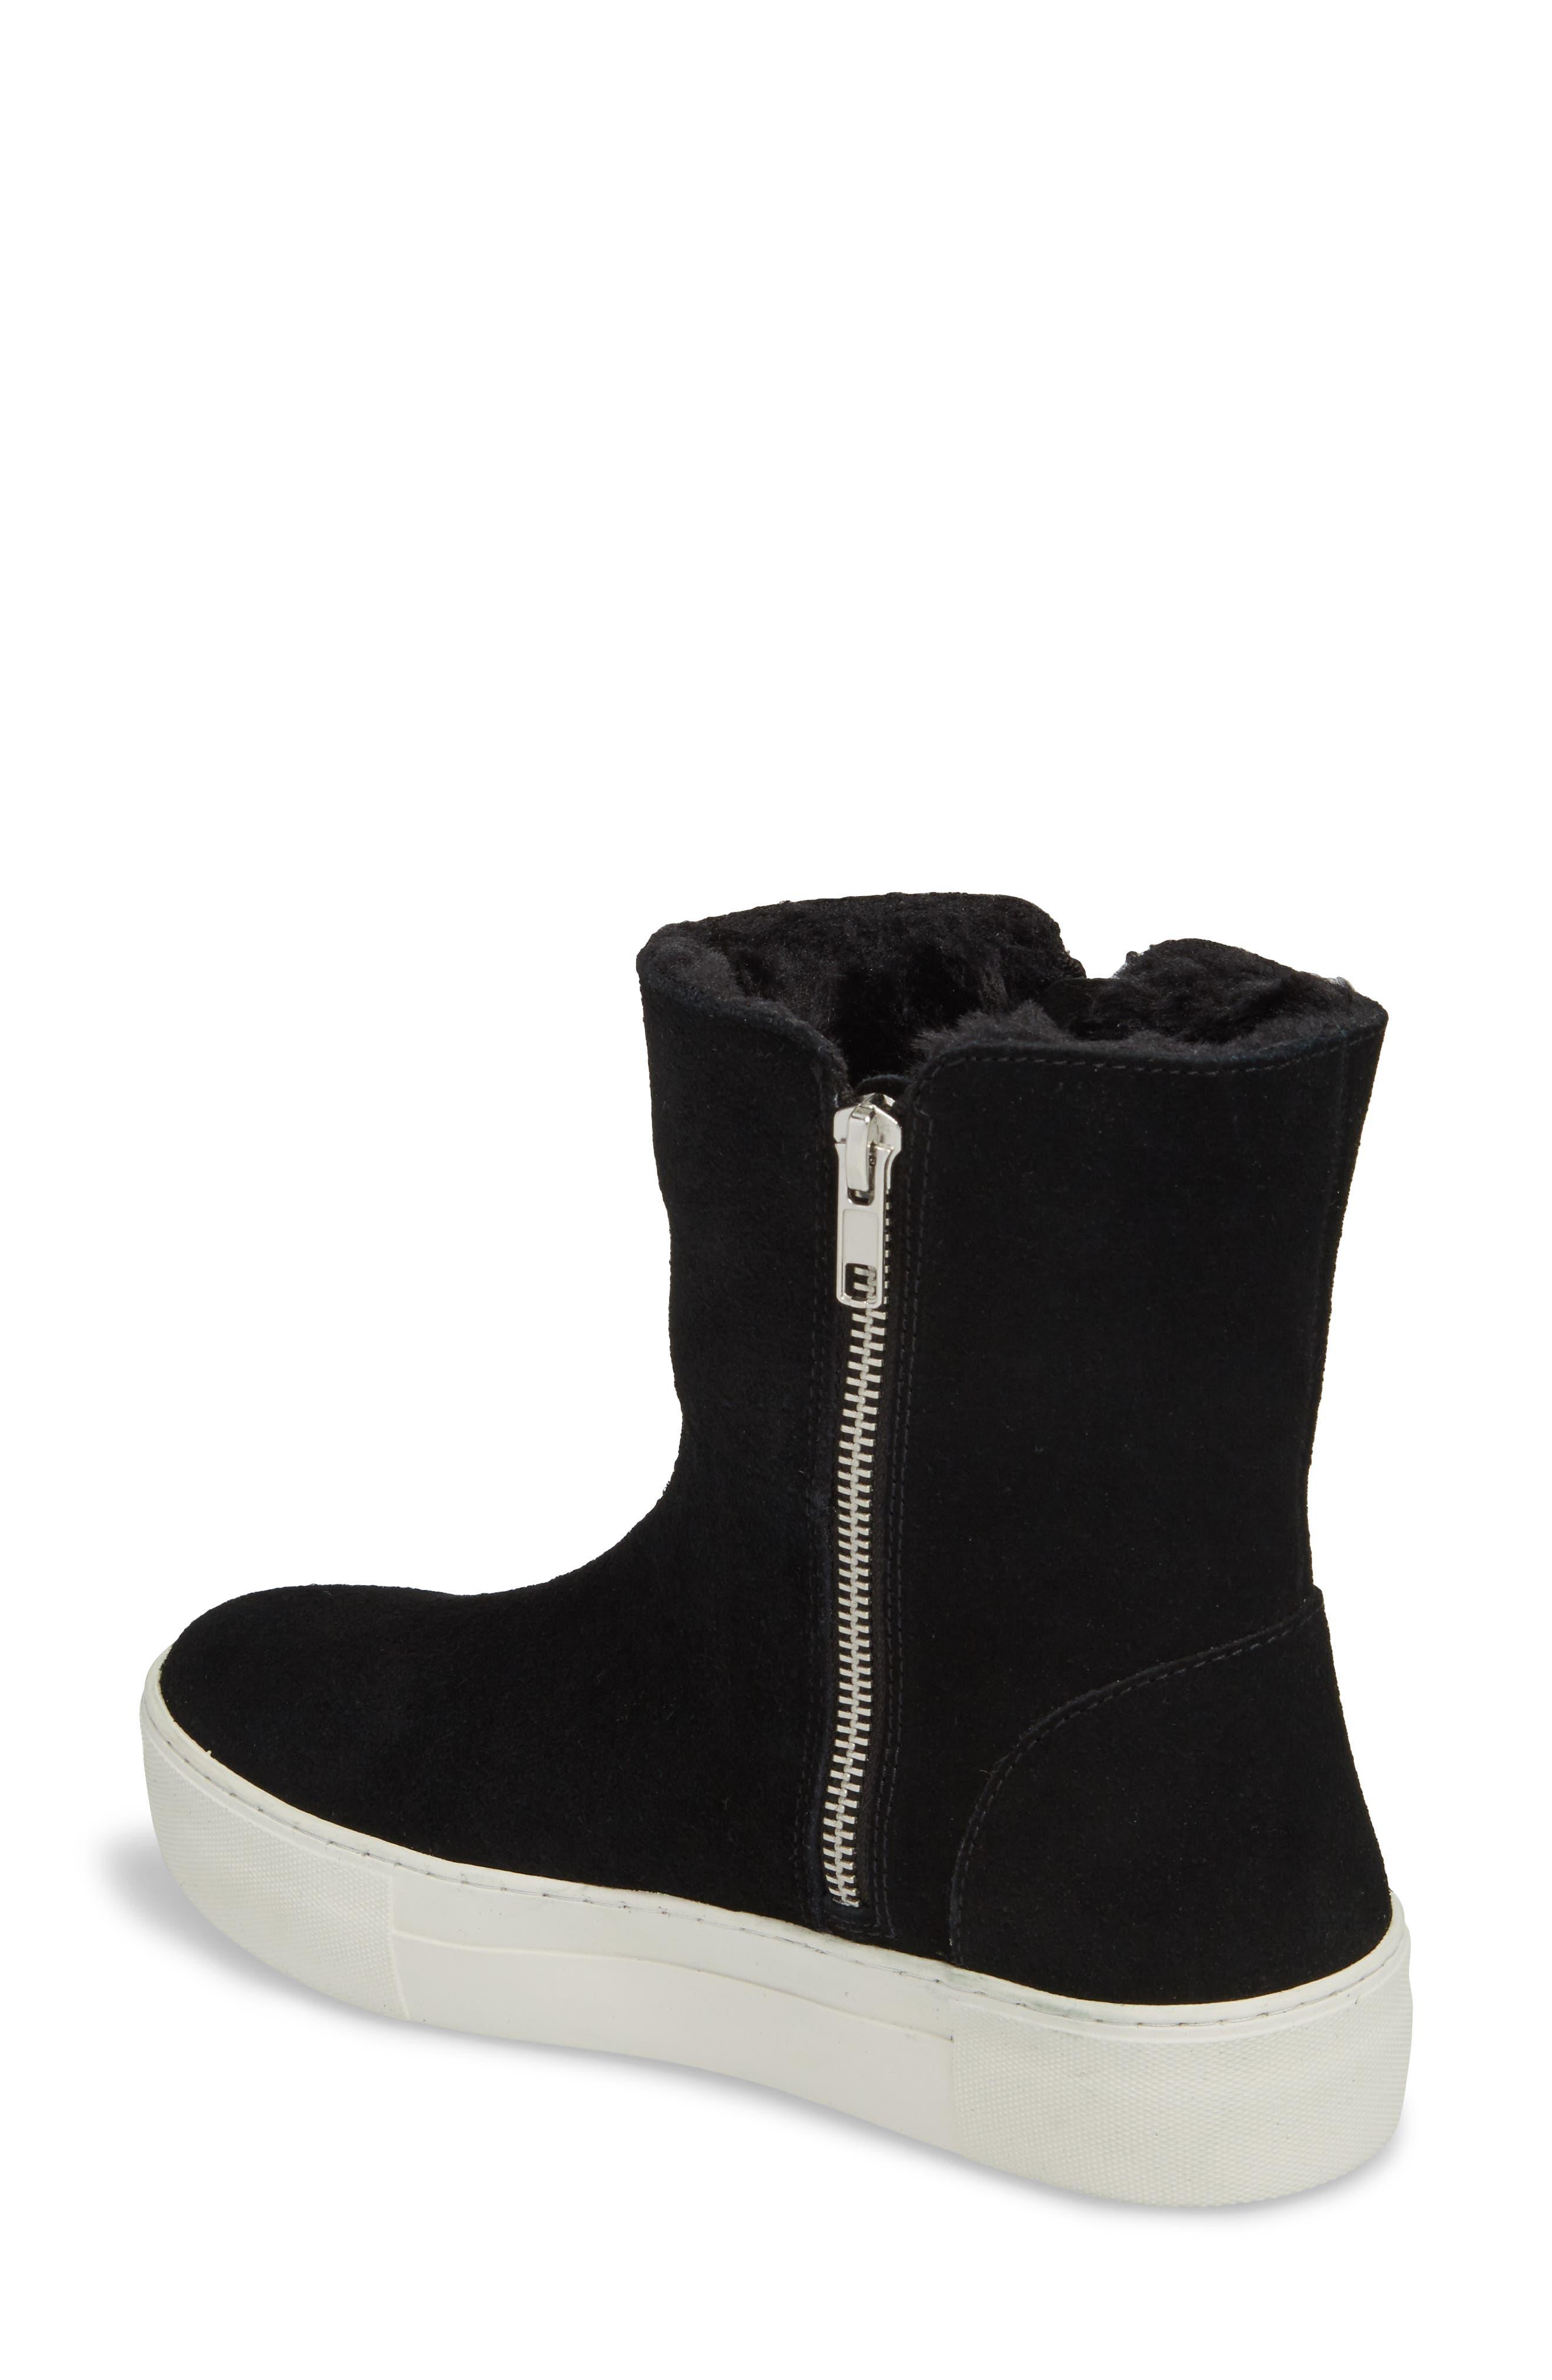 Garrson Sneaker Boot,                             Alternate thumbnail 2, color,                             006